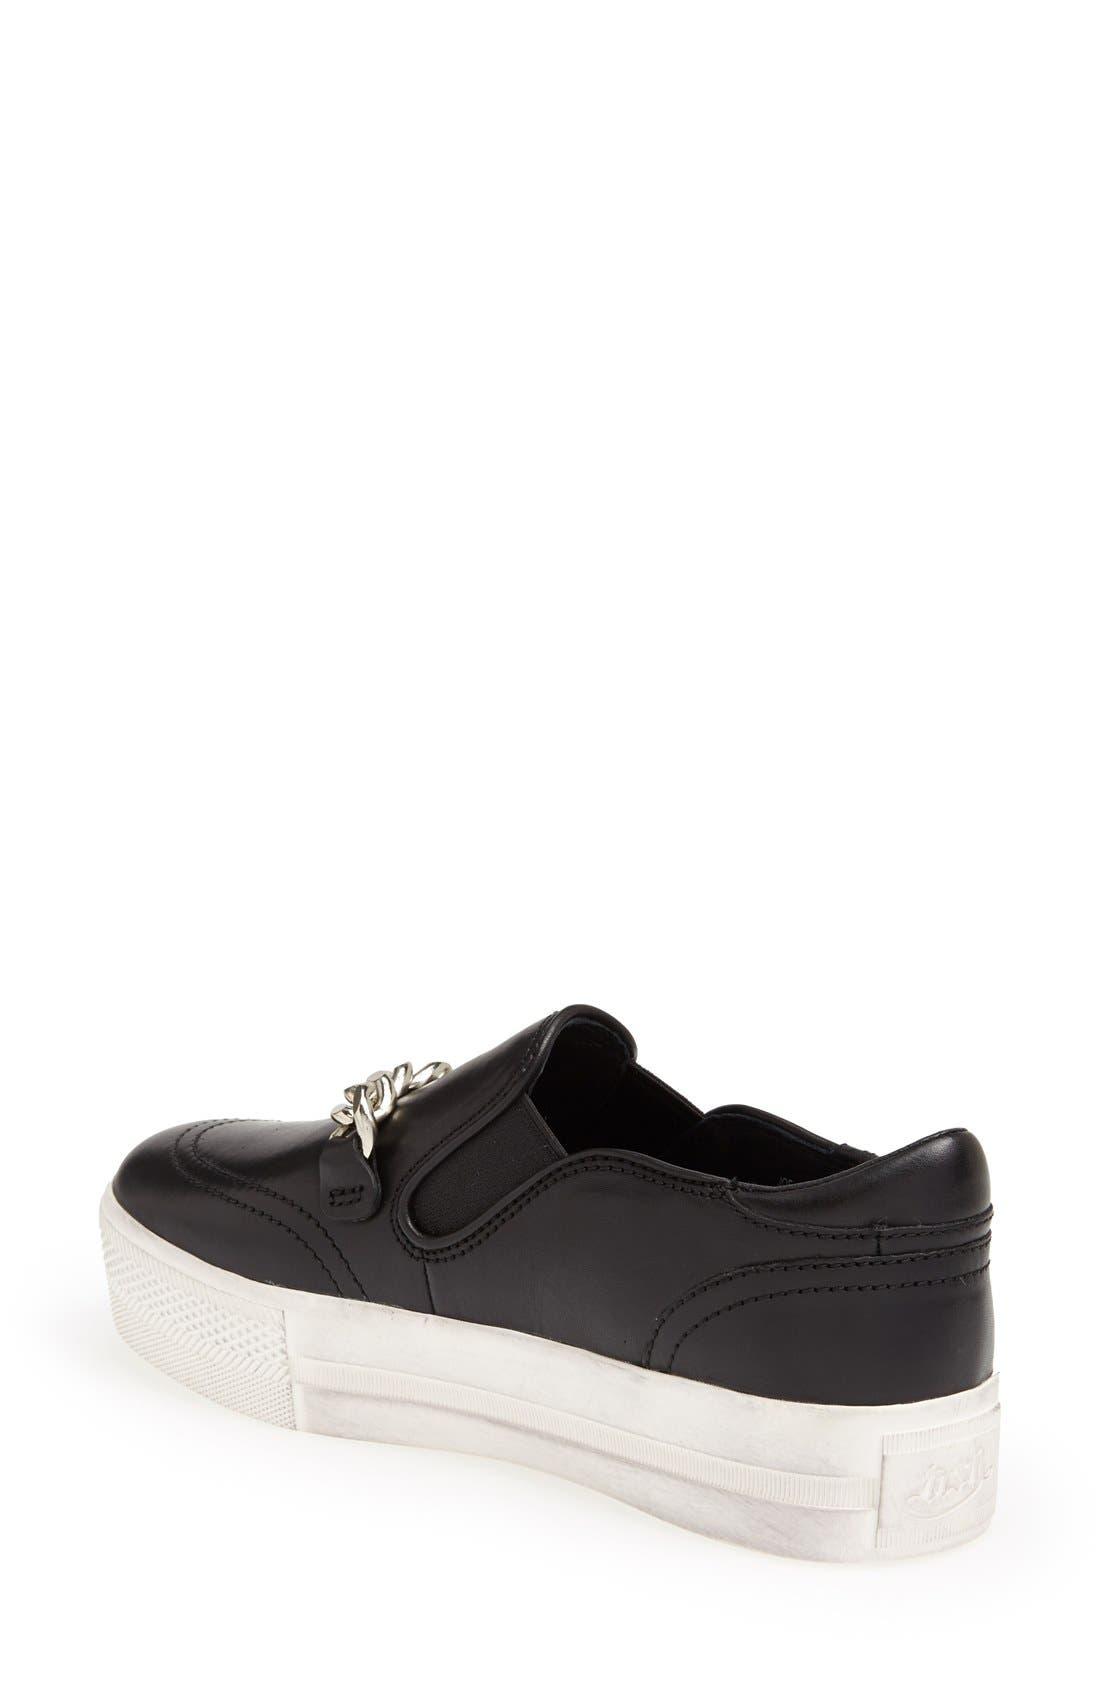 'Joe' Platform Sneaker,                             Alternate thumbnail 4, color,                             001